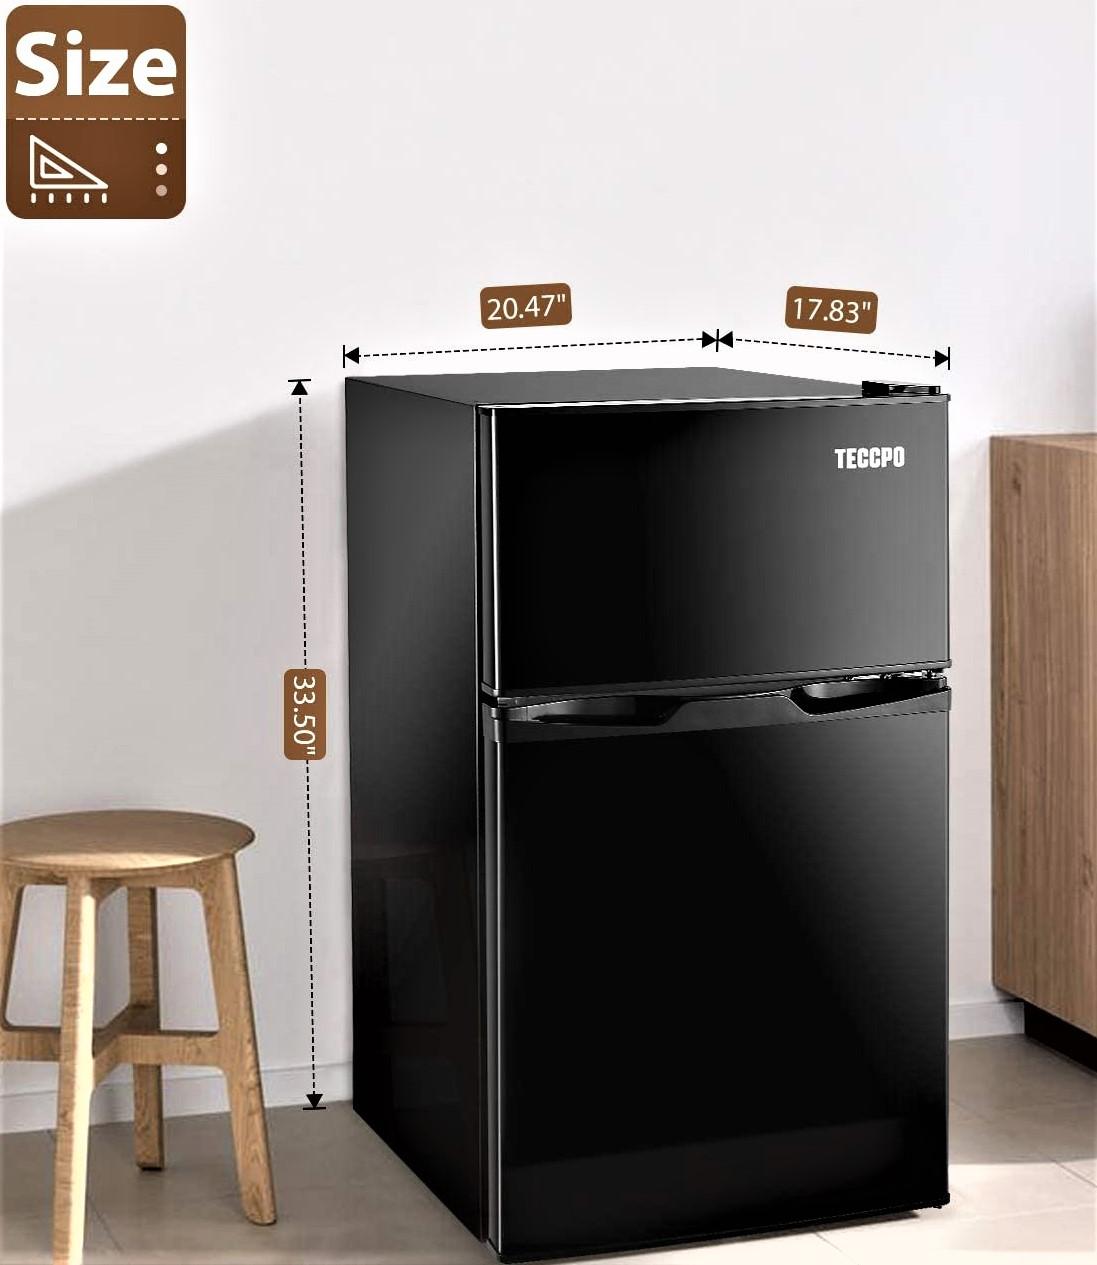 TECCPO Mini Fridge with Freezer, 3.0 Cu.Ft Specs